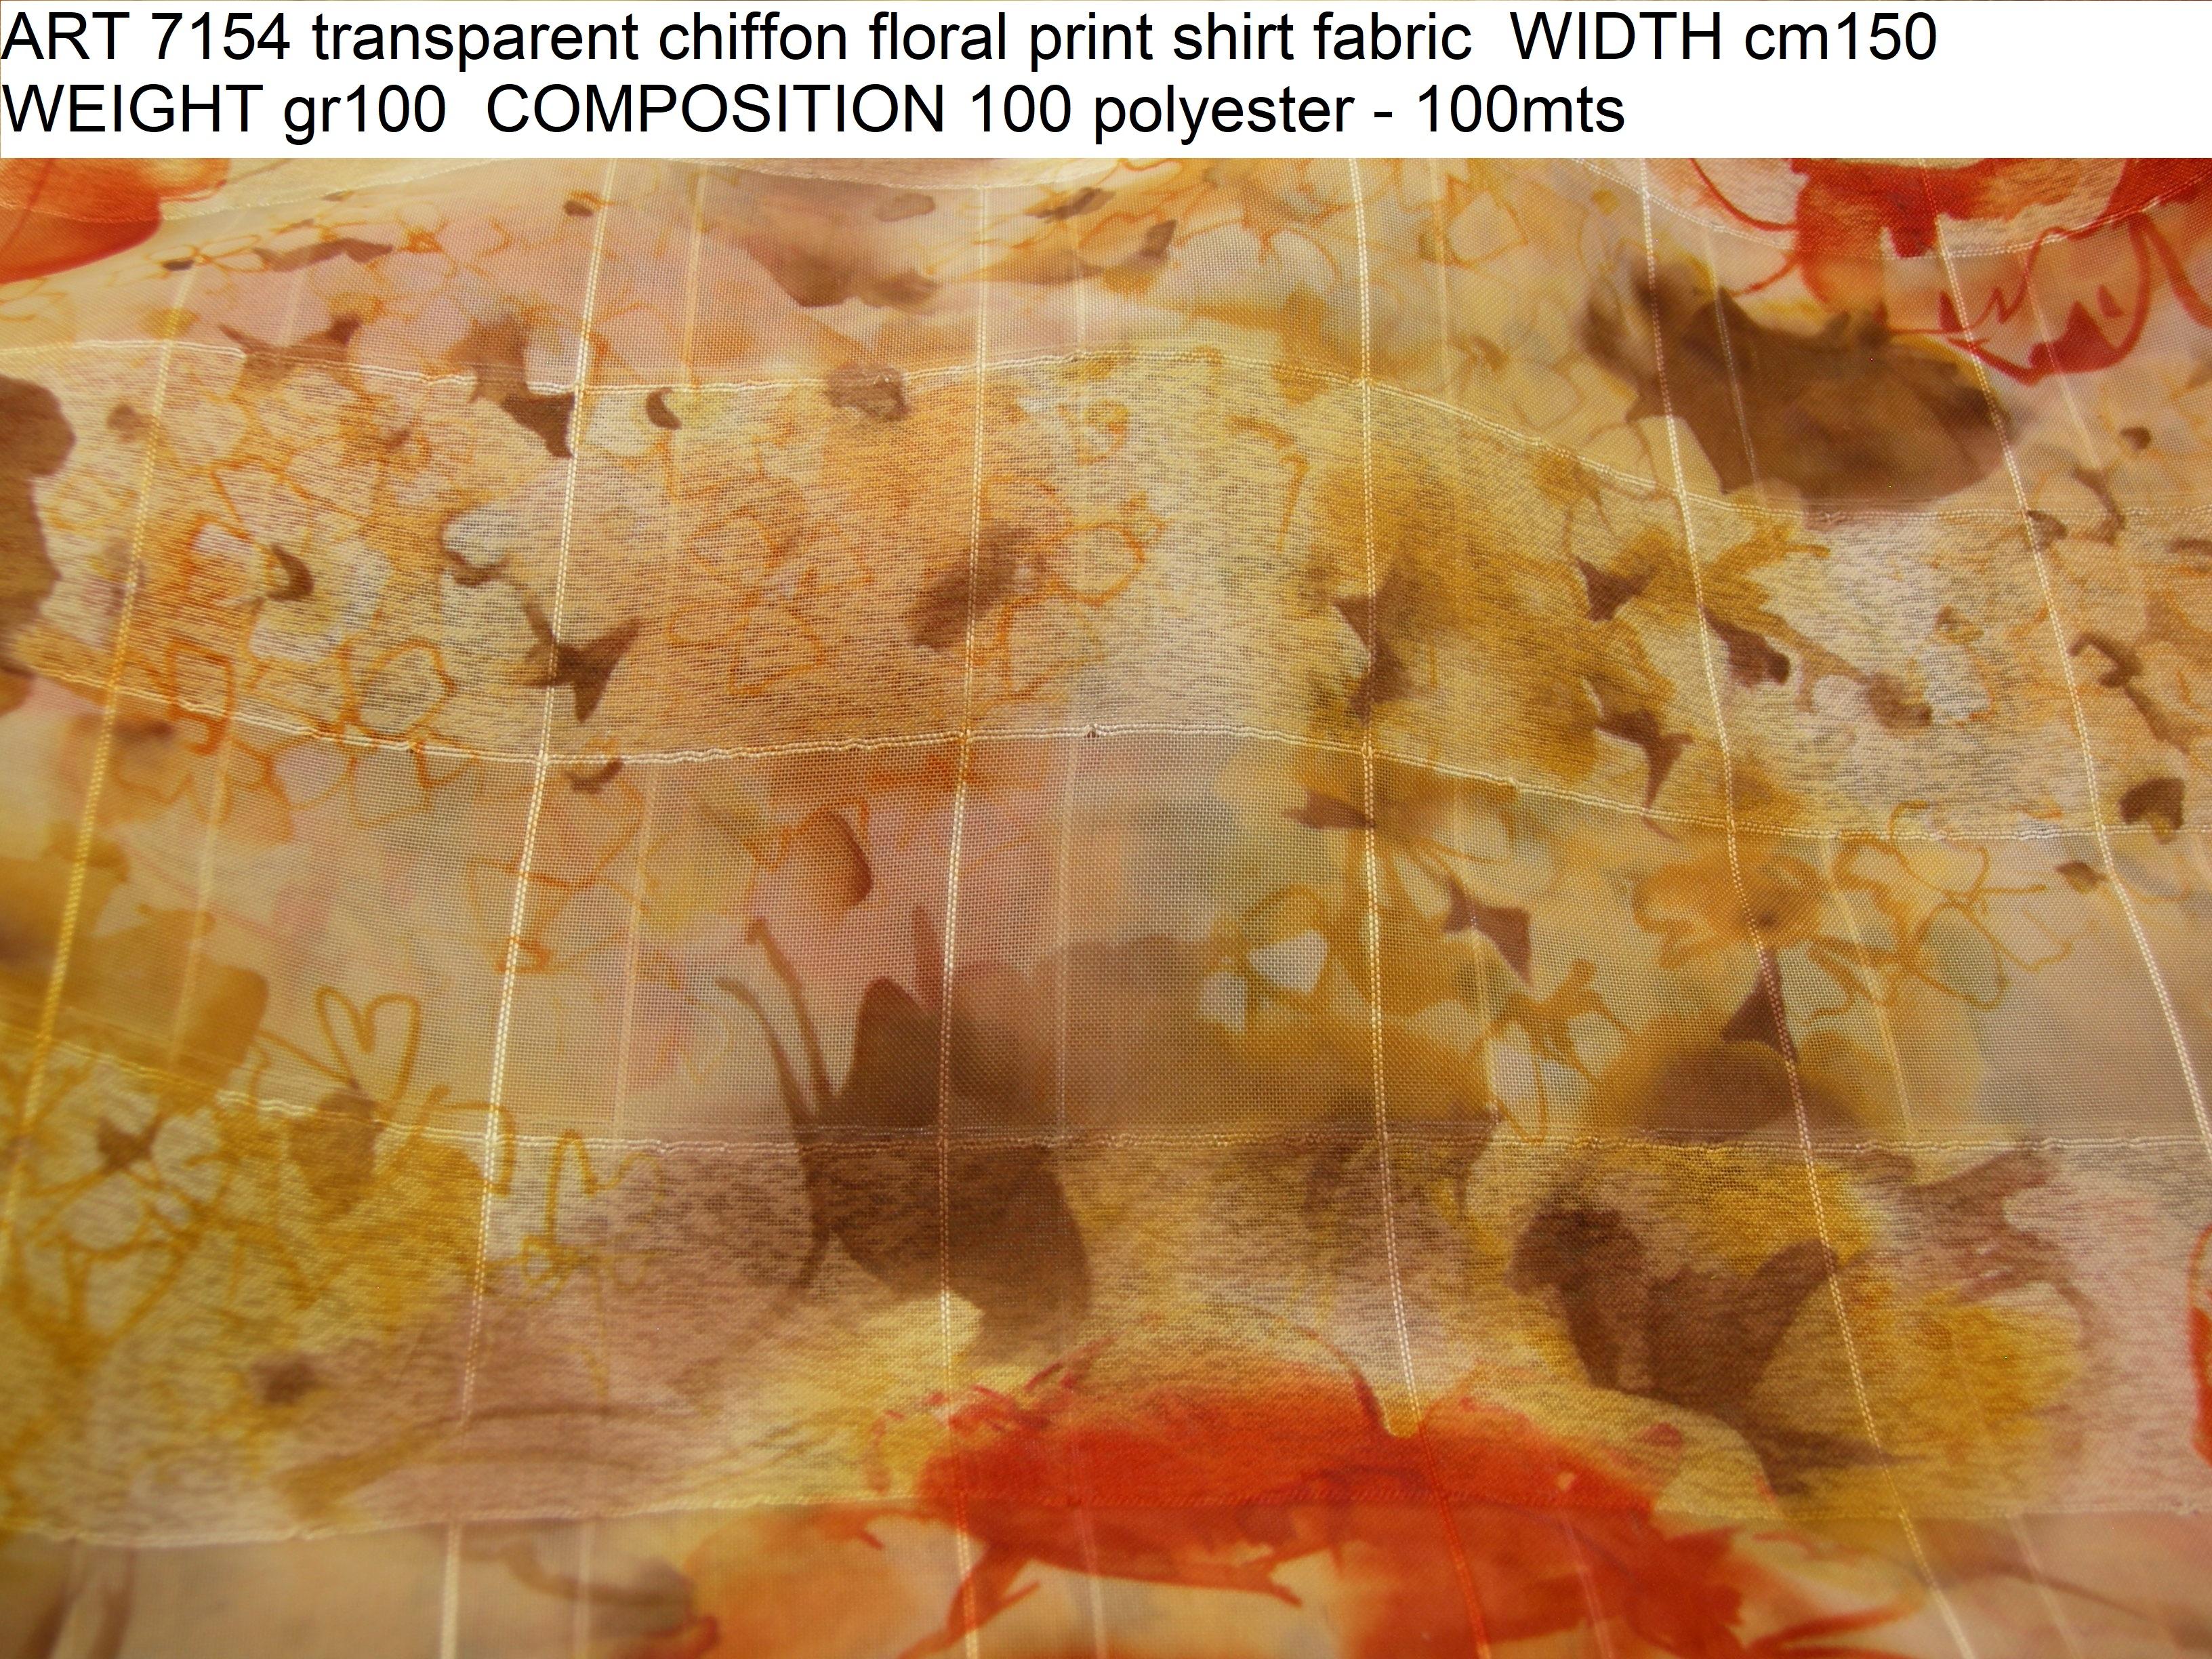 ART 7154 transparent chiffon floral print shirt fabric WIDTH cm150 WEIGHT gr100 COMPOSITION 100 polyester - 100mts